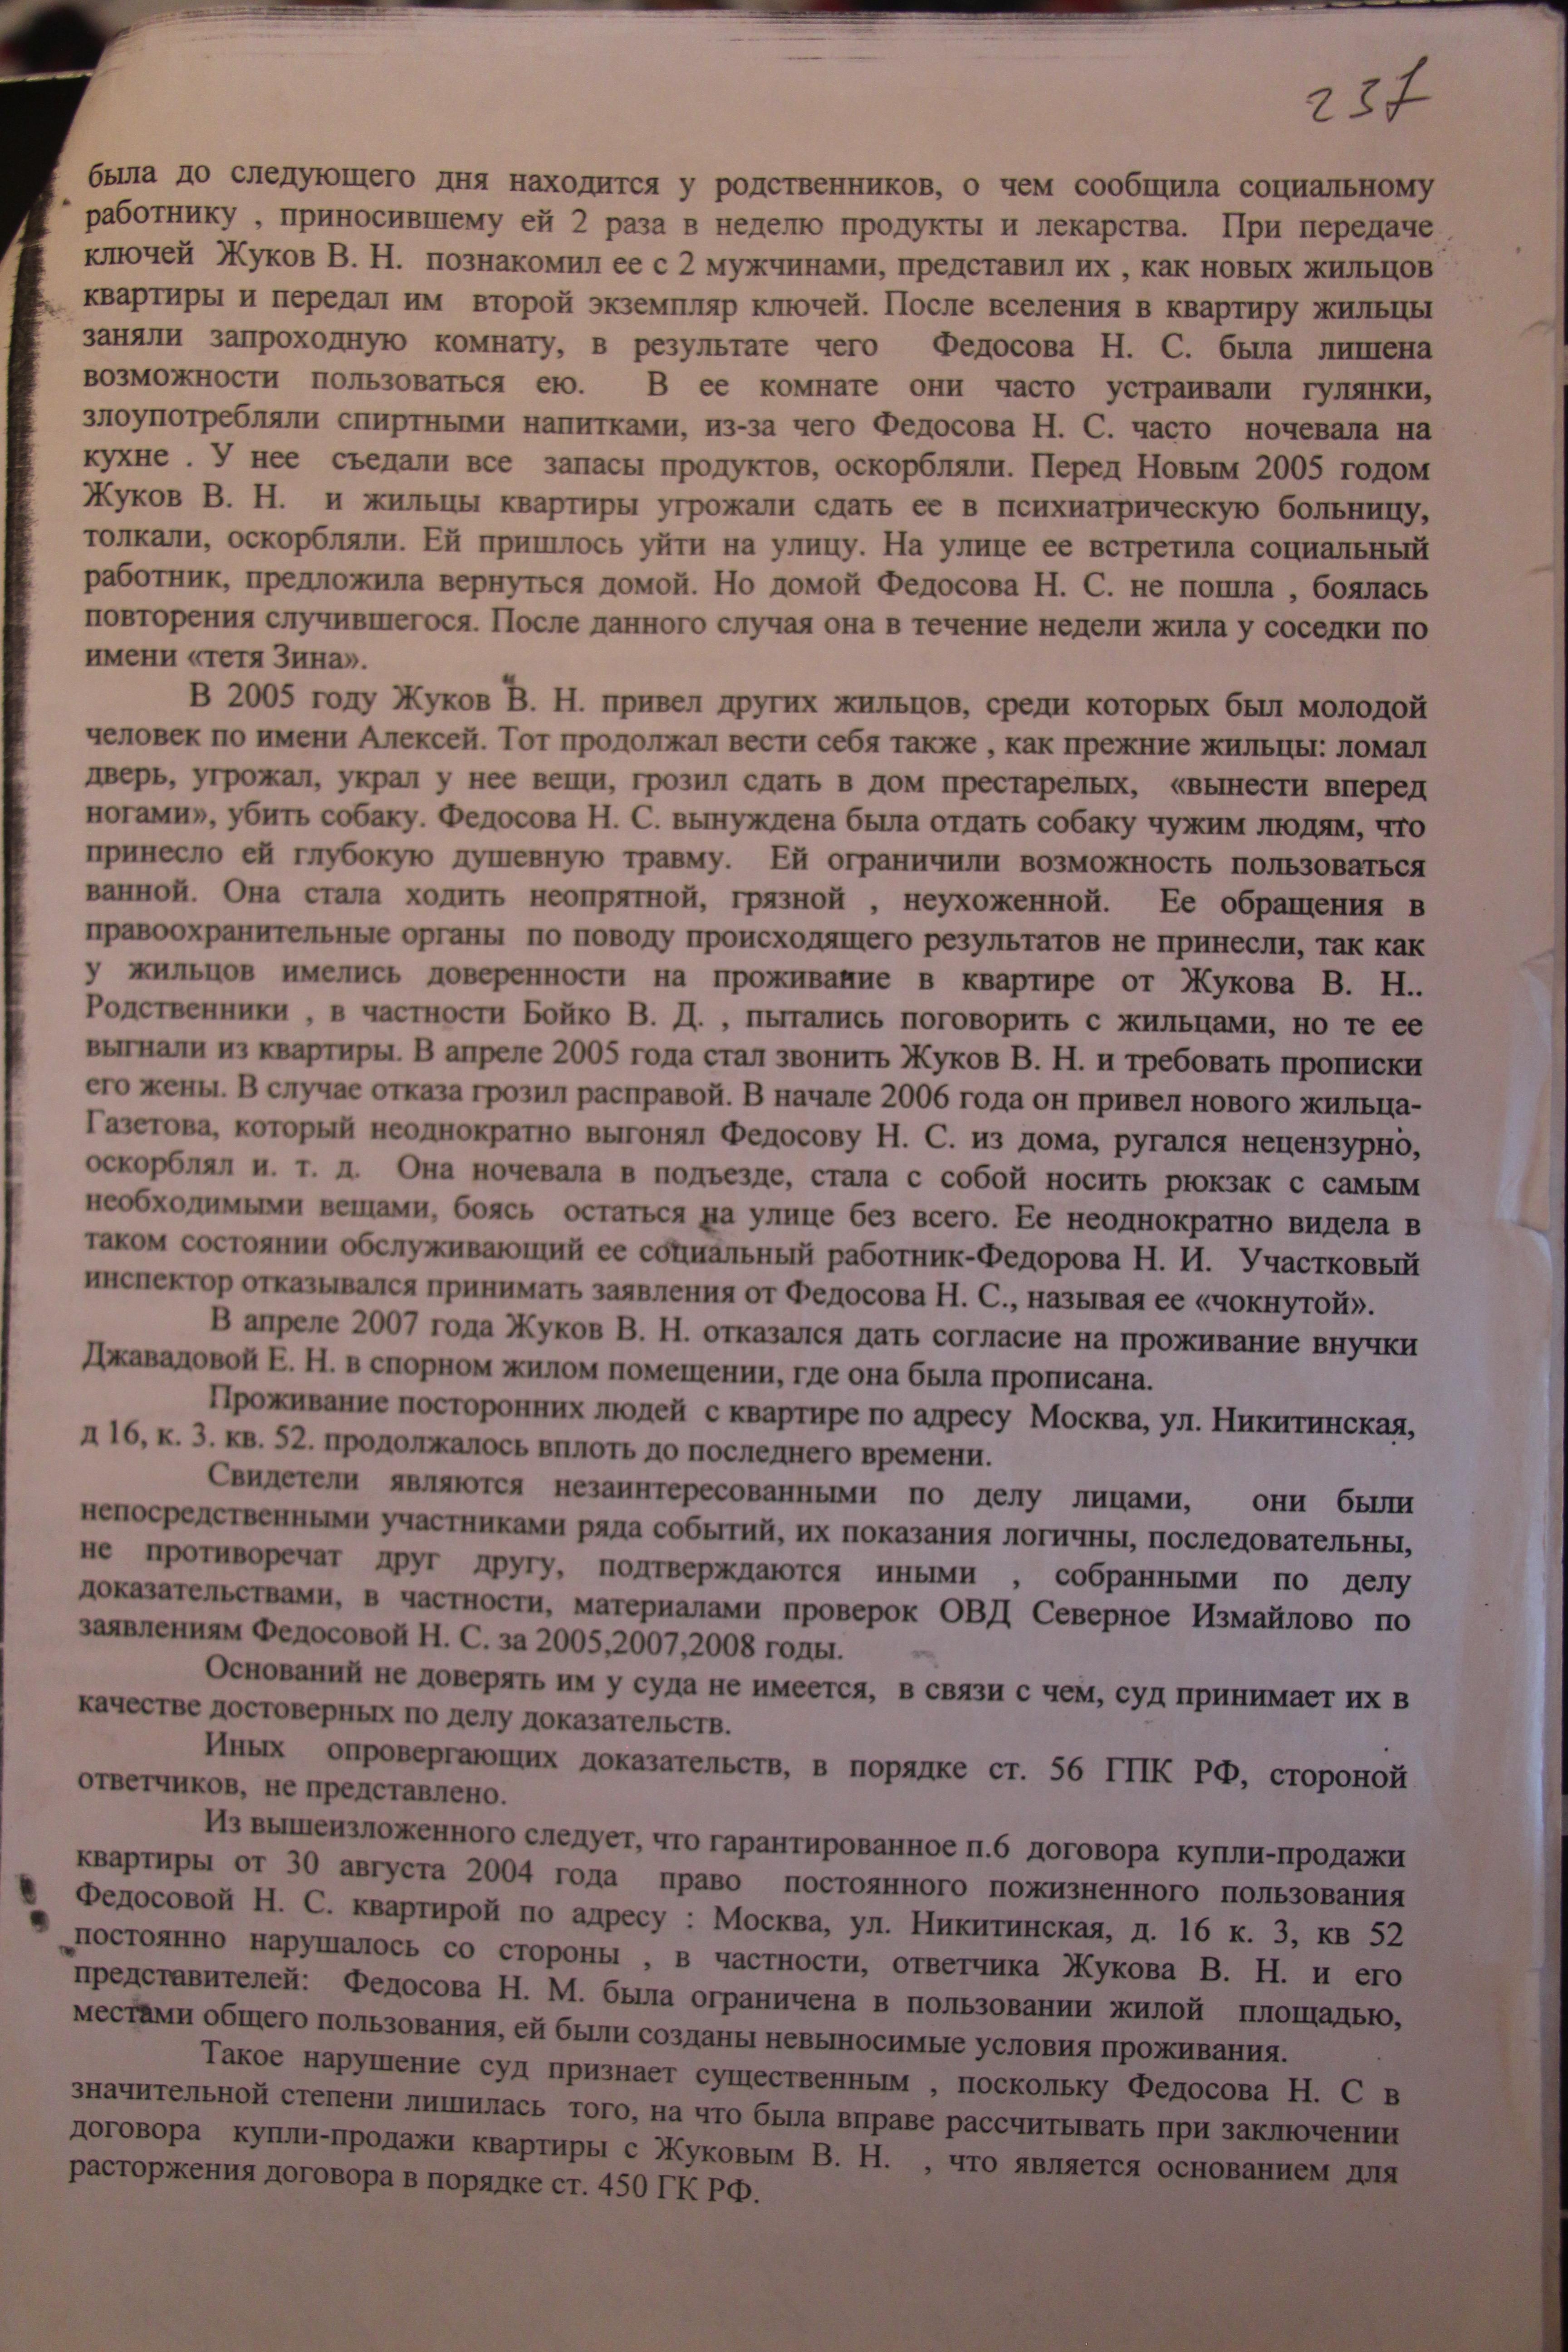 http://s9.uploads.ru/IXPS9.jpg